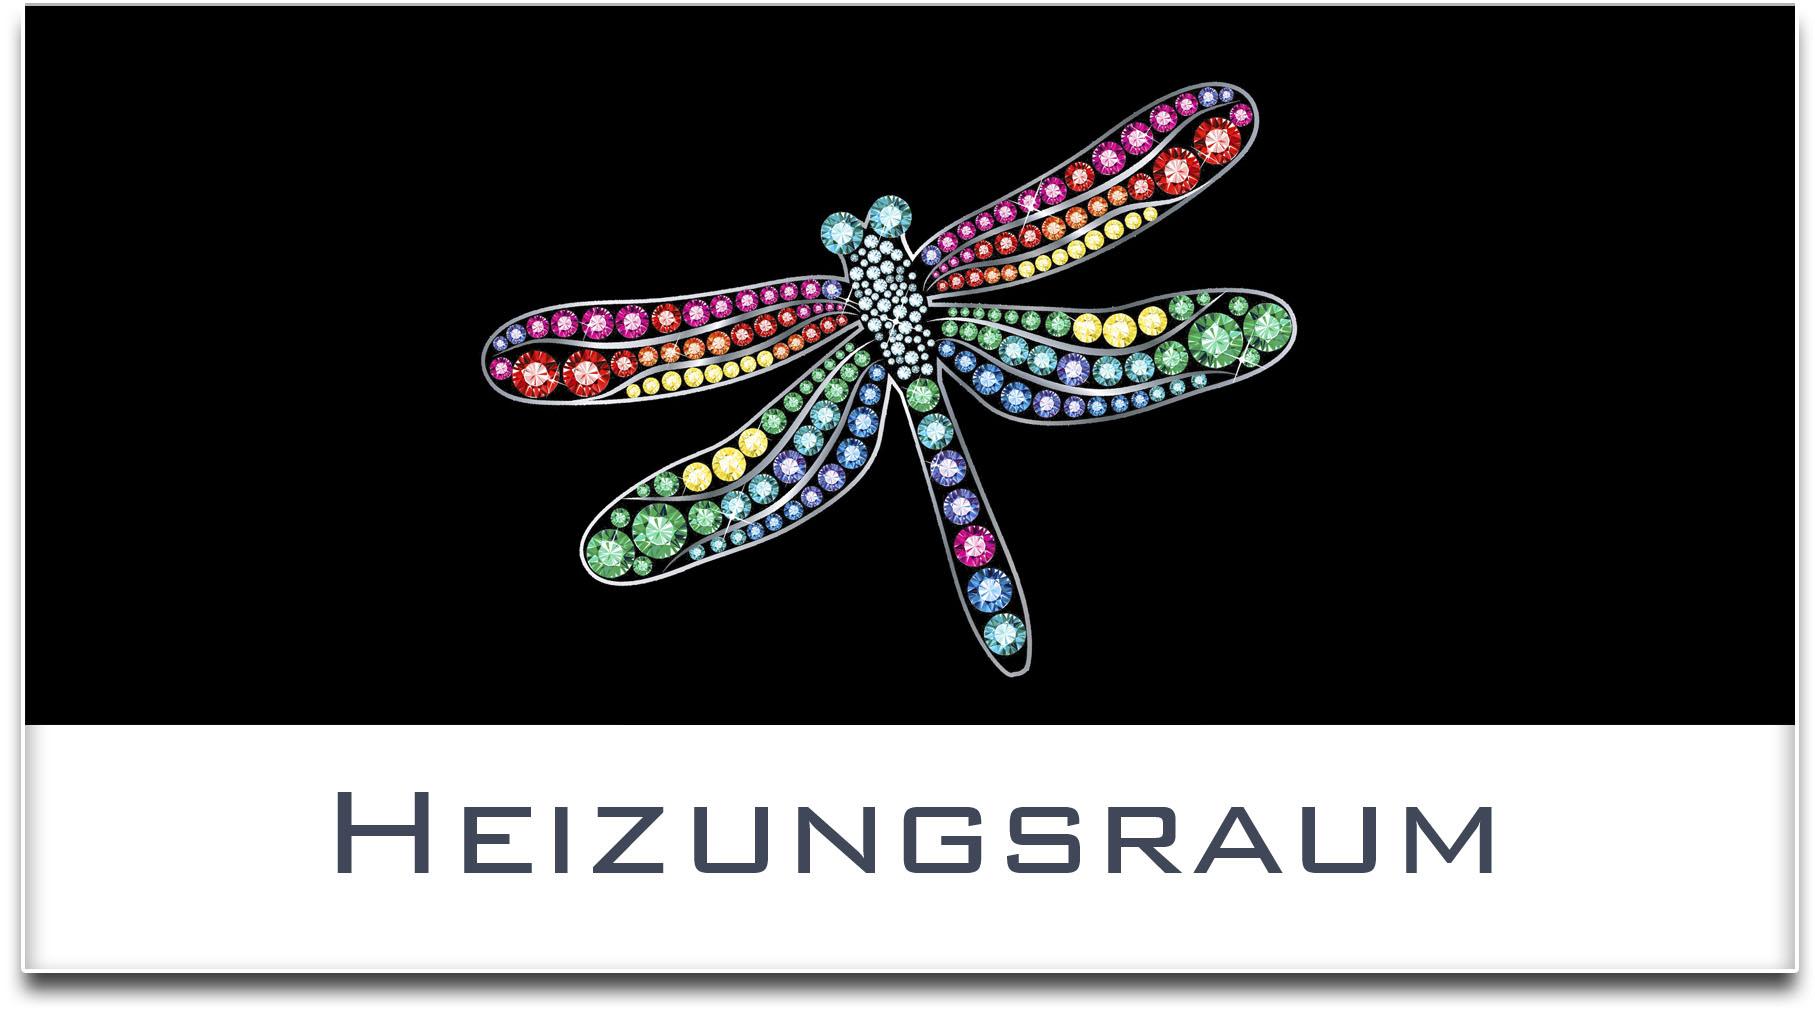 Türschild / Haustürschild / Libelle / Heizungsraum / Selbstklebend